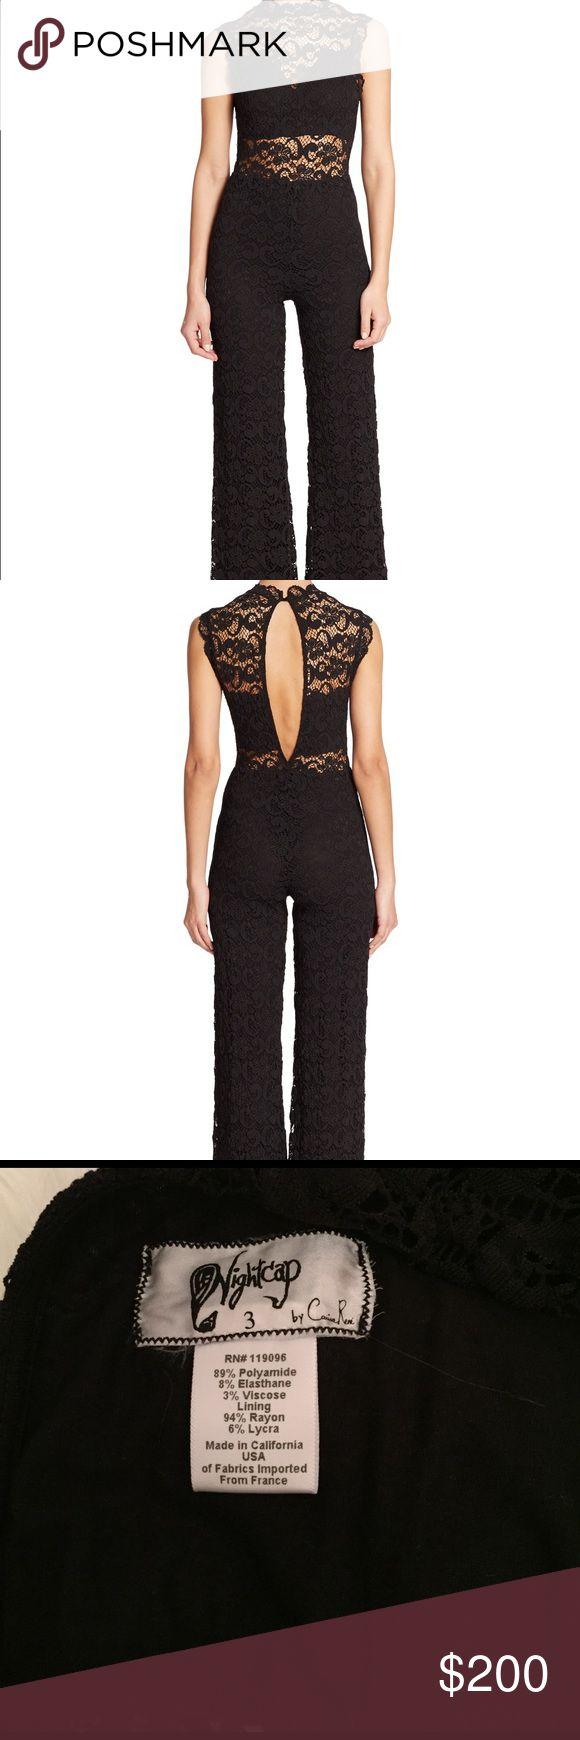 Nightcap black lace jumpsuit, size medium Nightcap black lace jumpsuit, size medium Nightcap Pants Jumpsuits & Rompers